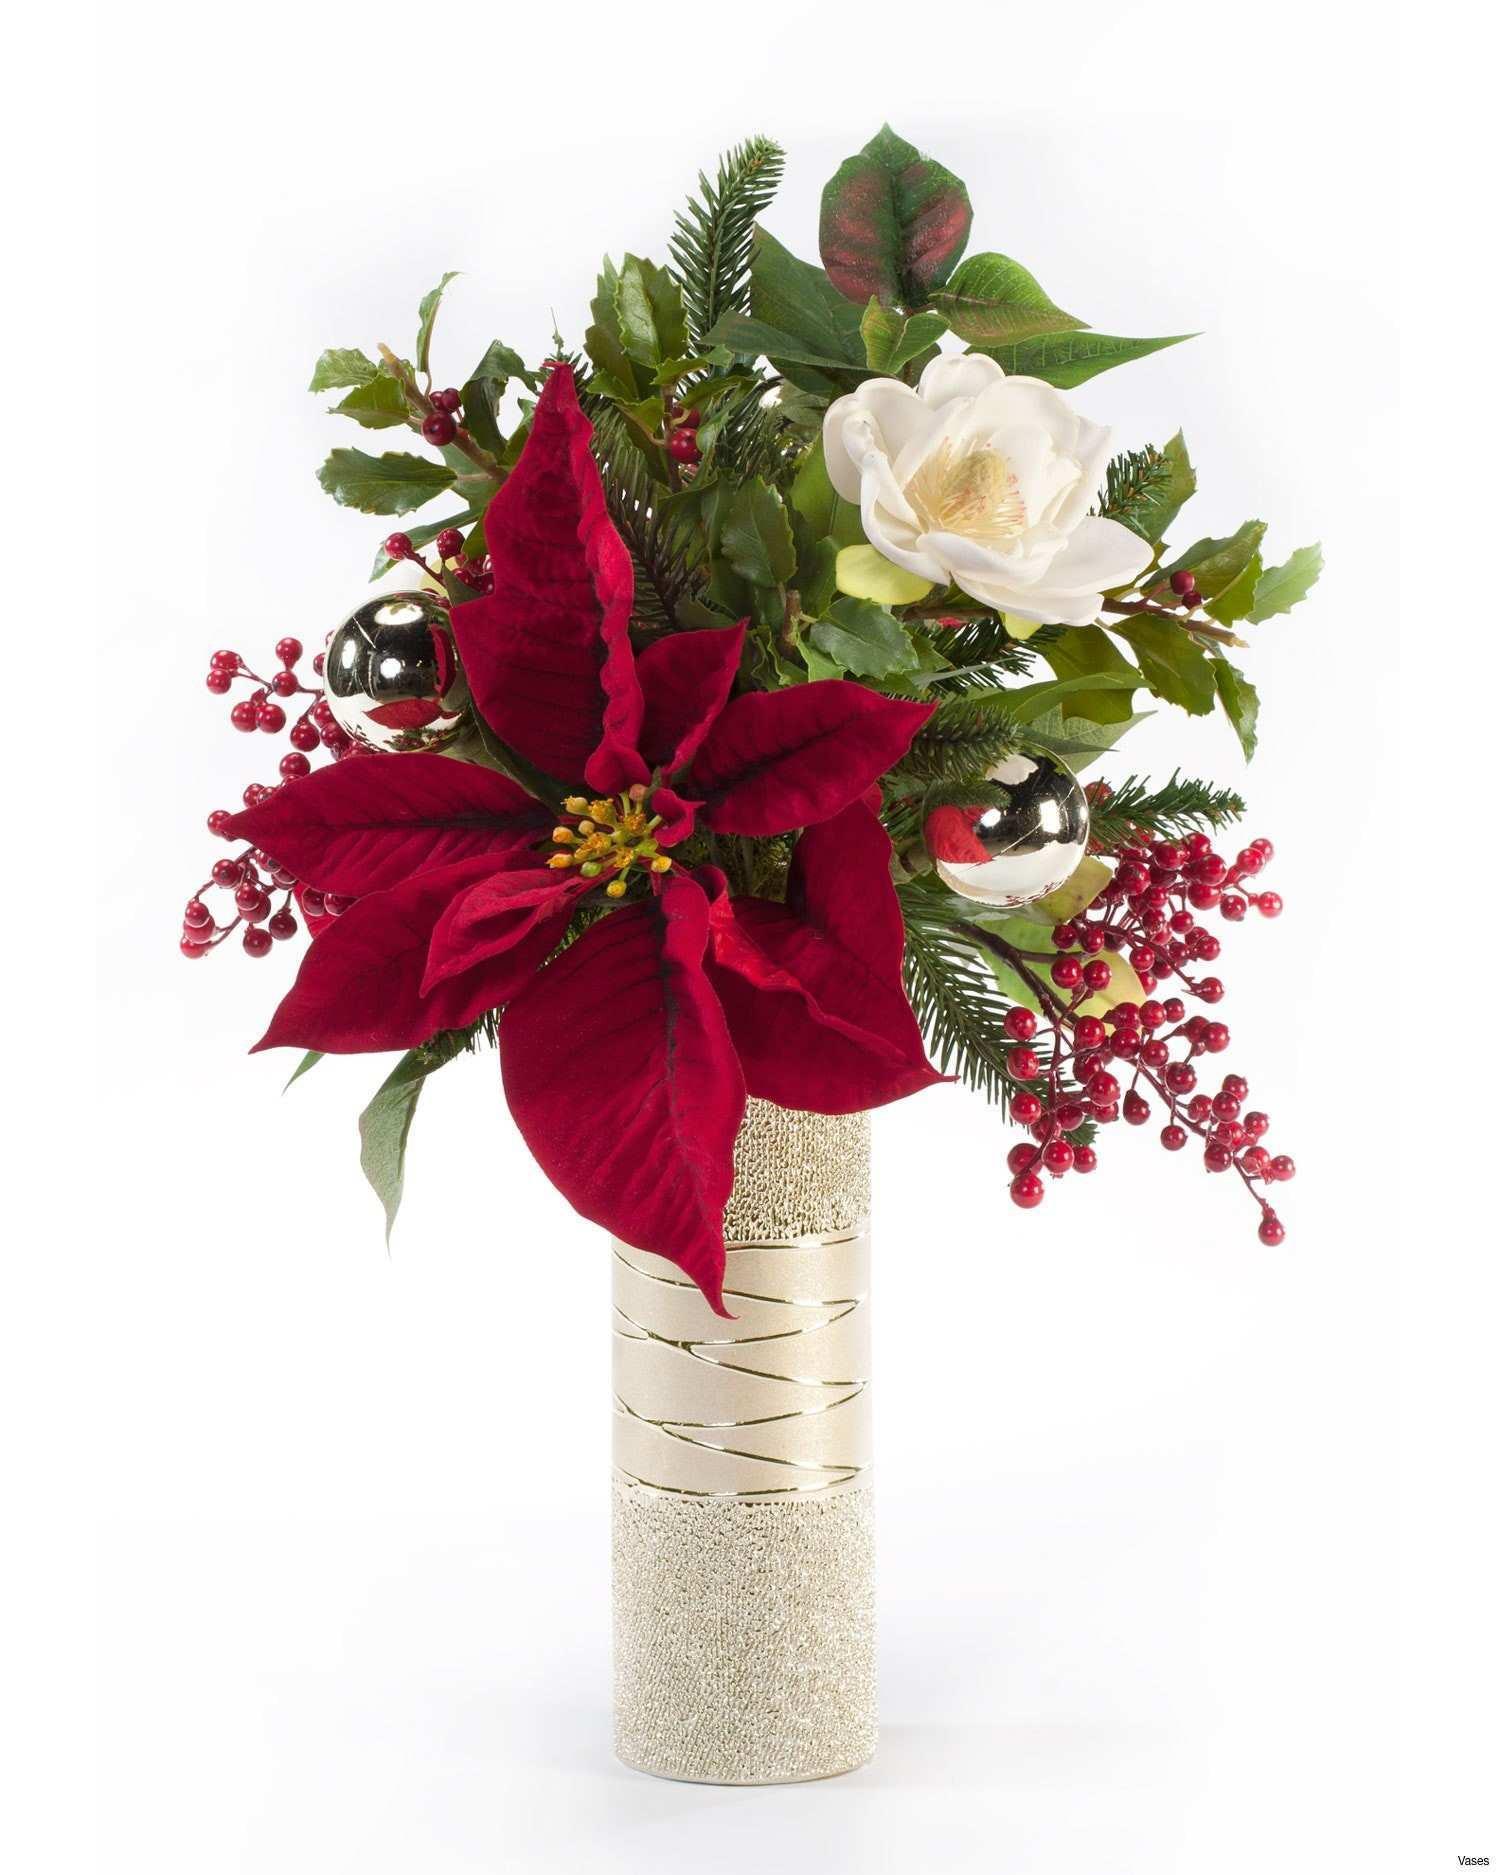 square bud vase of luxury flower ideas garden ideas with regard to lsa flower colour bud vase red h vases i 0d wing design ideas fake poinsettias